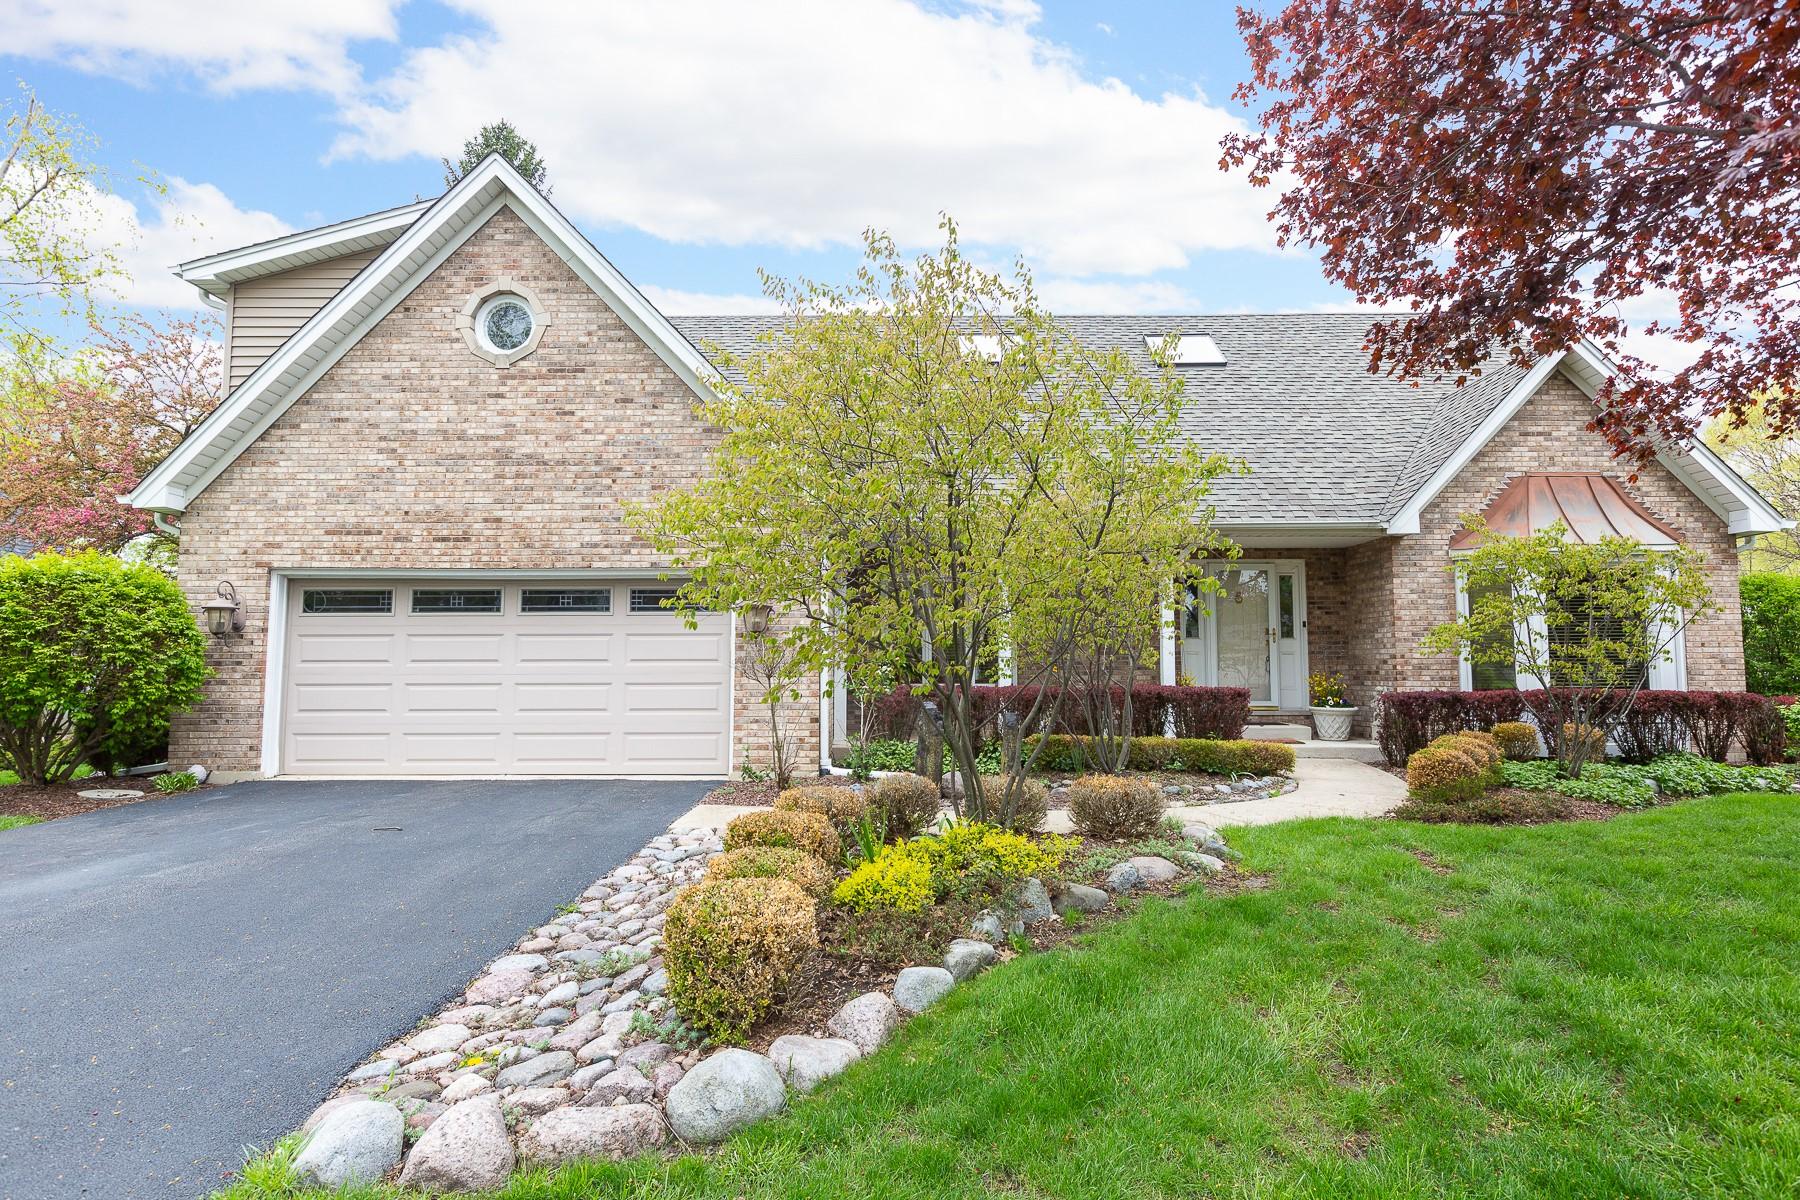 Single Family Homes for Active at Stellar Location! 419 Brighton Drive Wheaton, Illinois 60189 United States